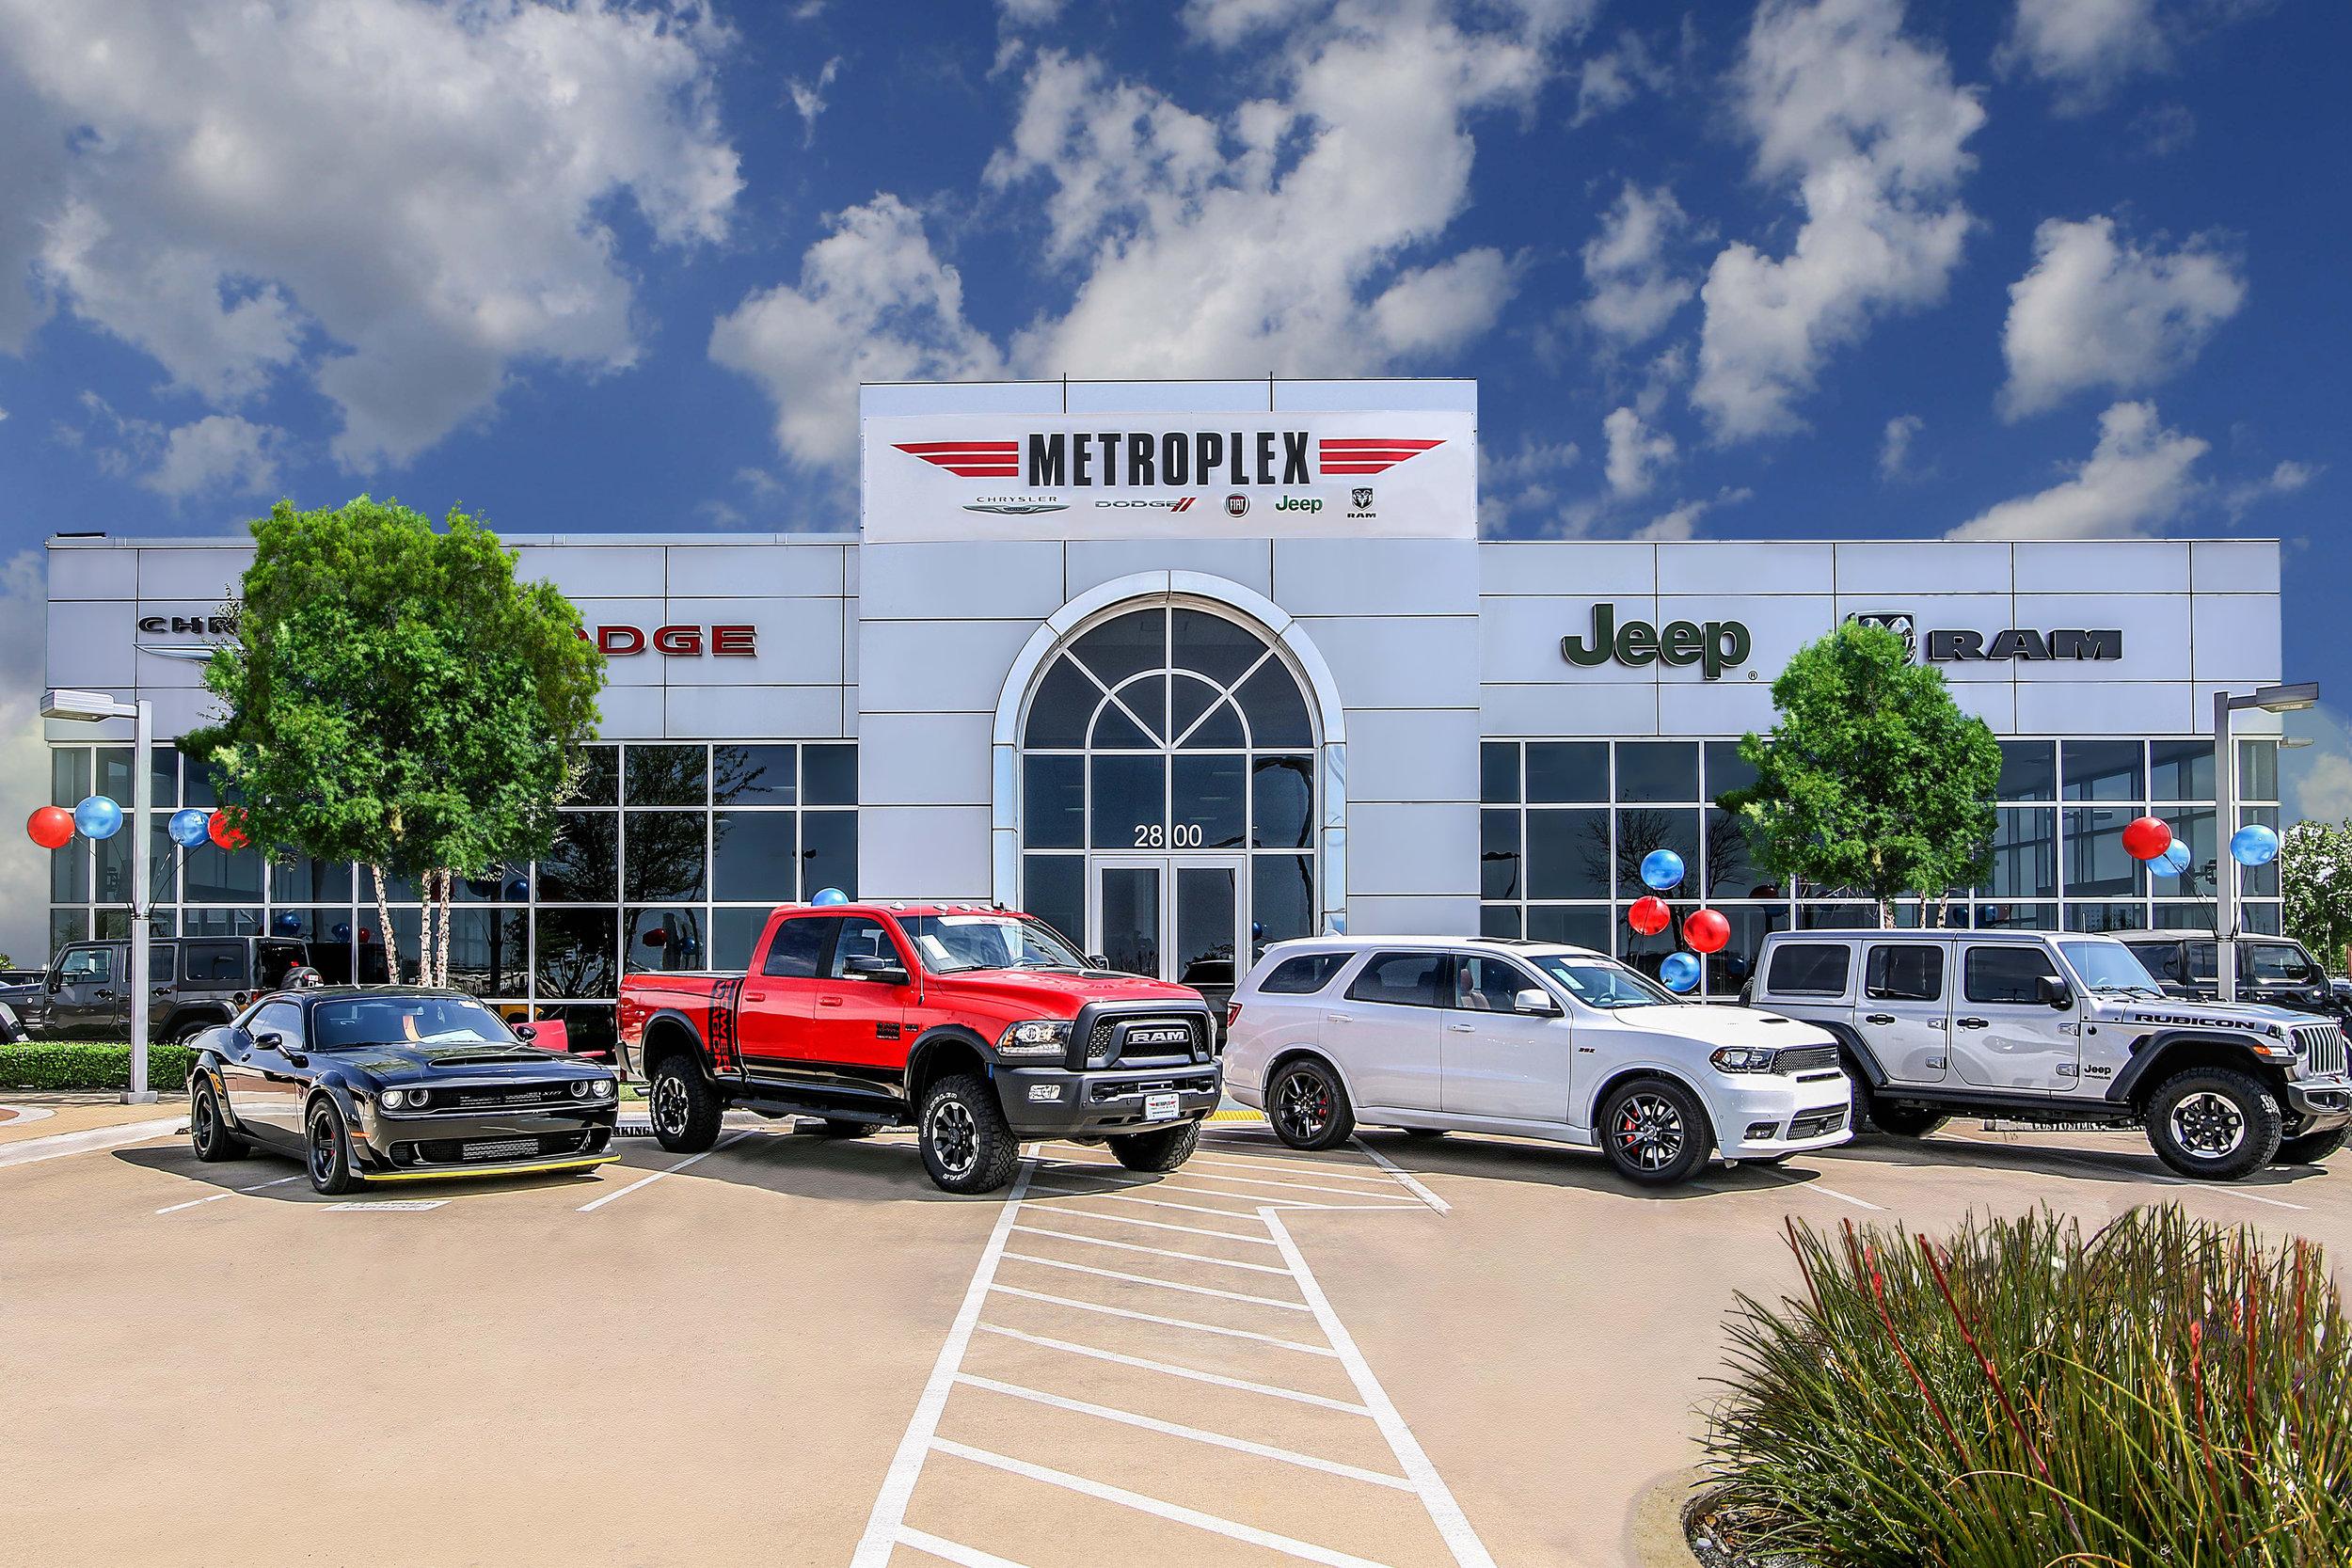 Metroplex-Chrysler-Dodge-Jeep-Ram-FIAT-Showroom1-LR.jpeg.jpg